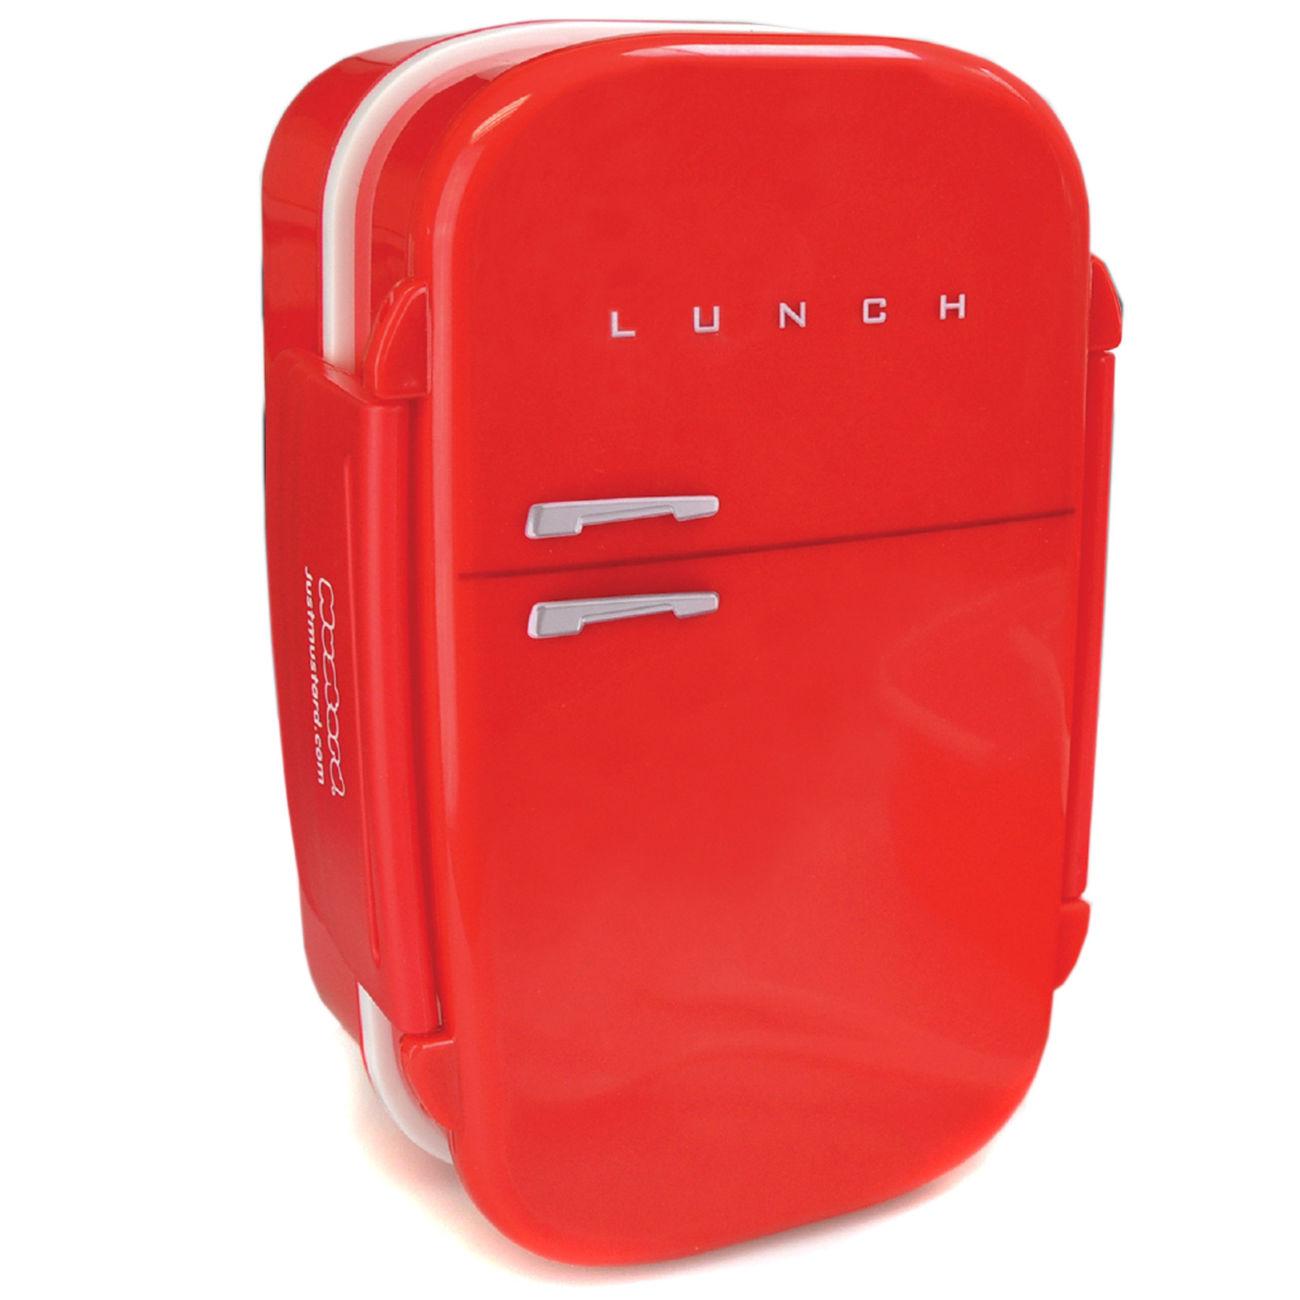 Mustard Lunch Box Retro Kühlschrank rot günstig kaufen - Kotte & Zeller